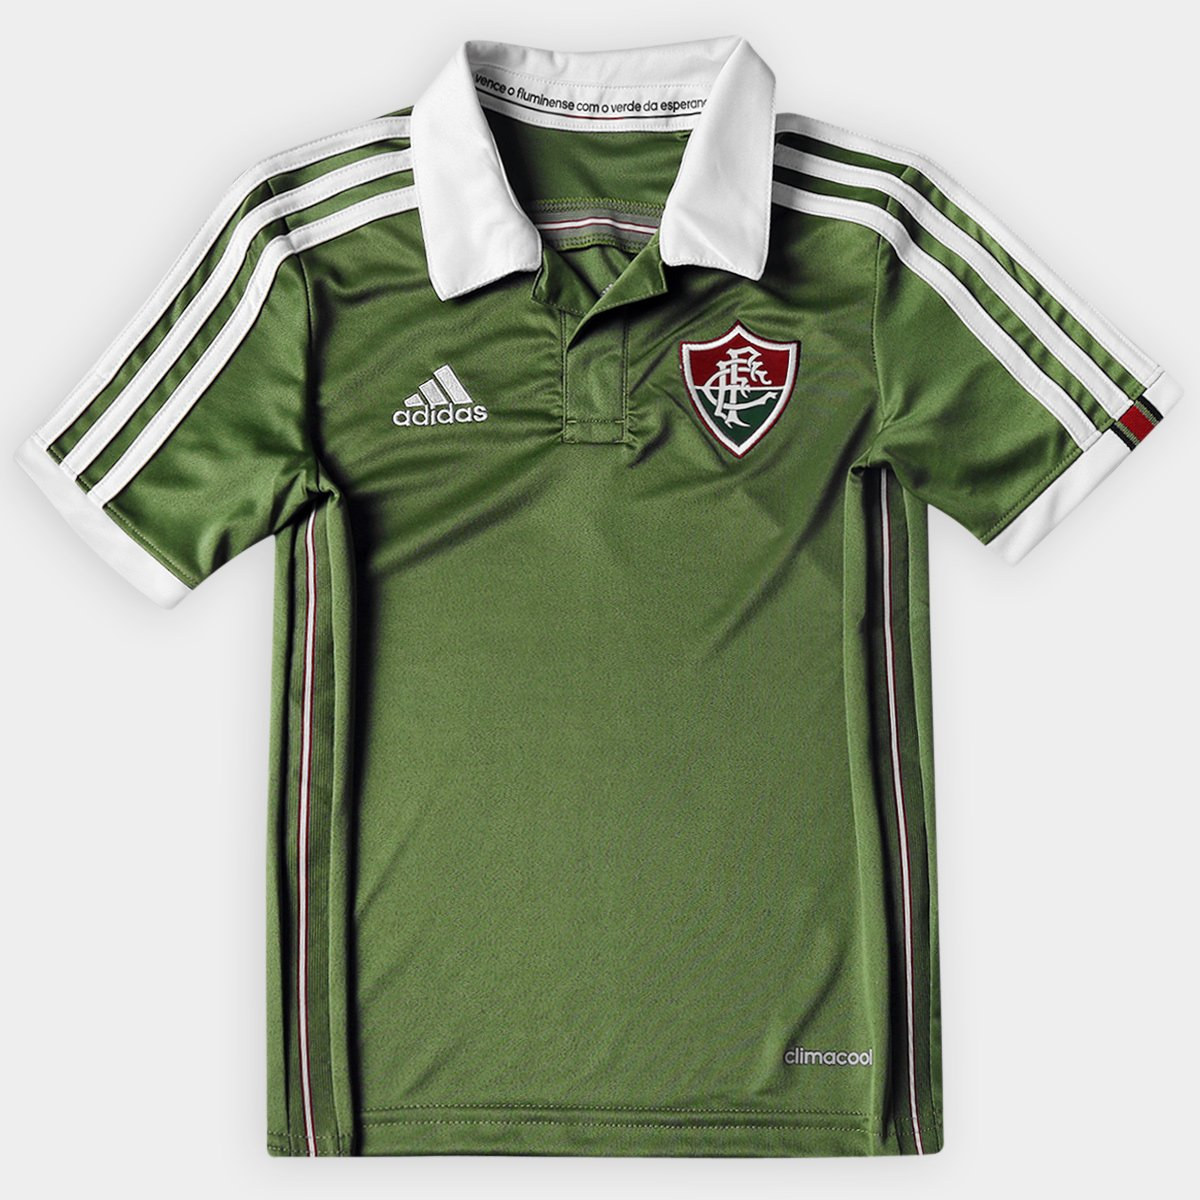 Camisa Fluminense Infantil III 2015 s nº Torcedor Adidas - Compre Agora  ed2cfe8bcd12f